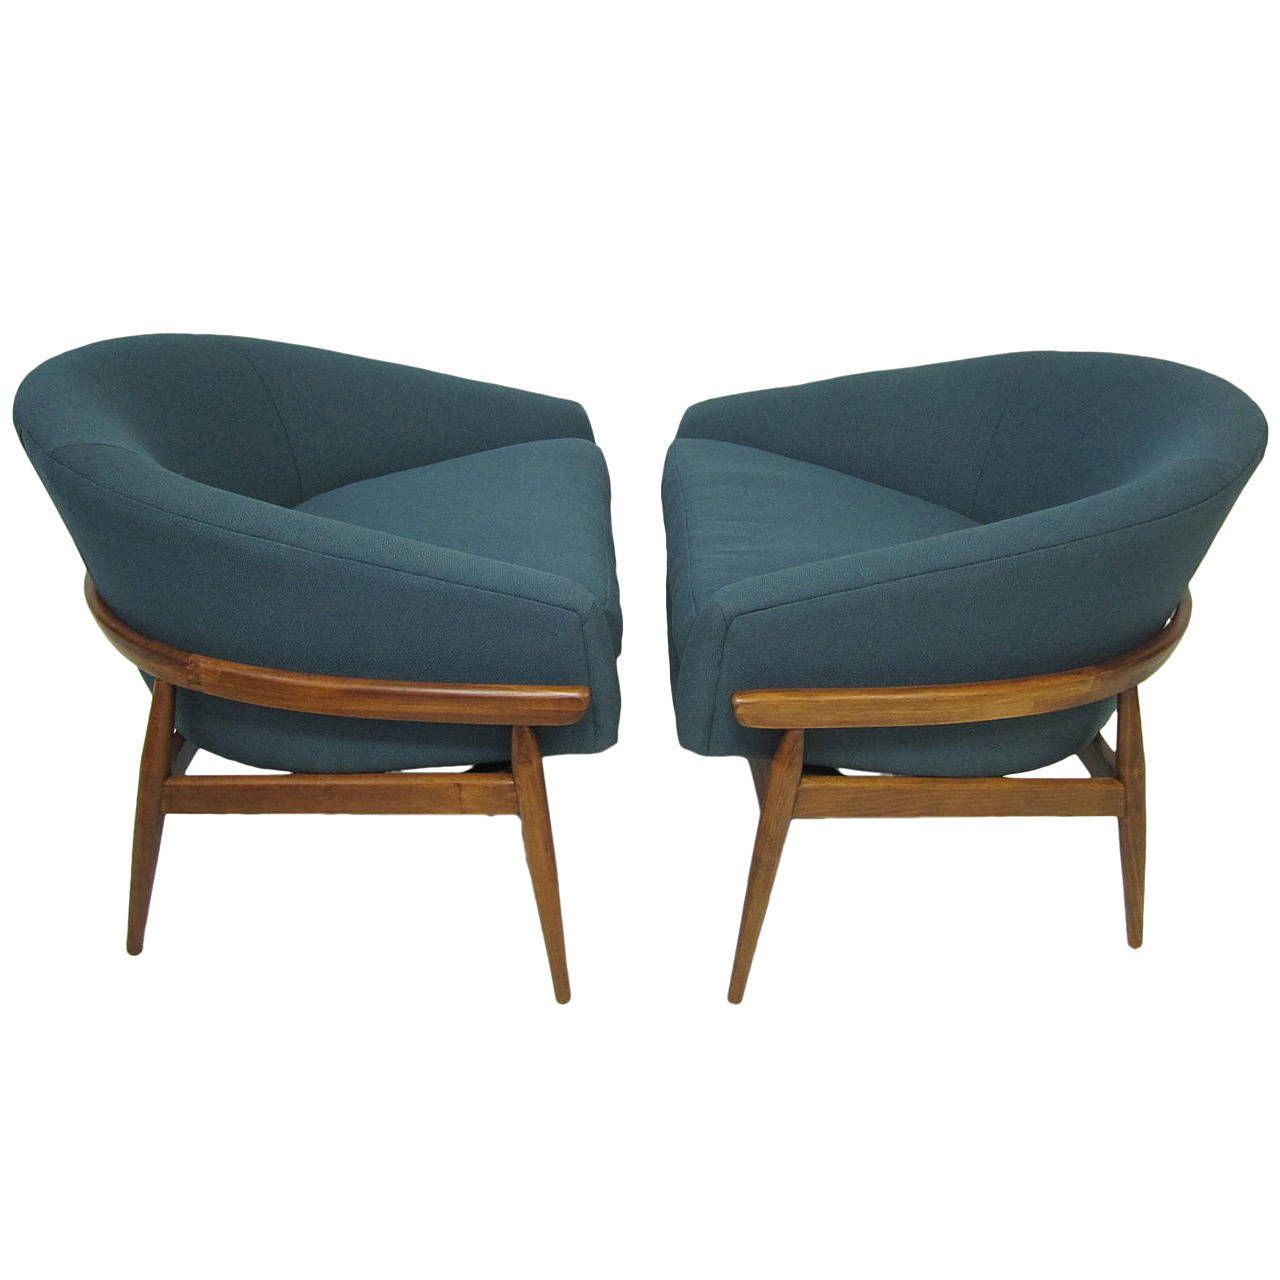 Amazing pair of milo baughman wide barrel back lounge chairs mid century modern